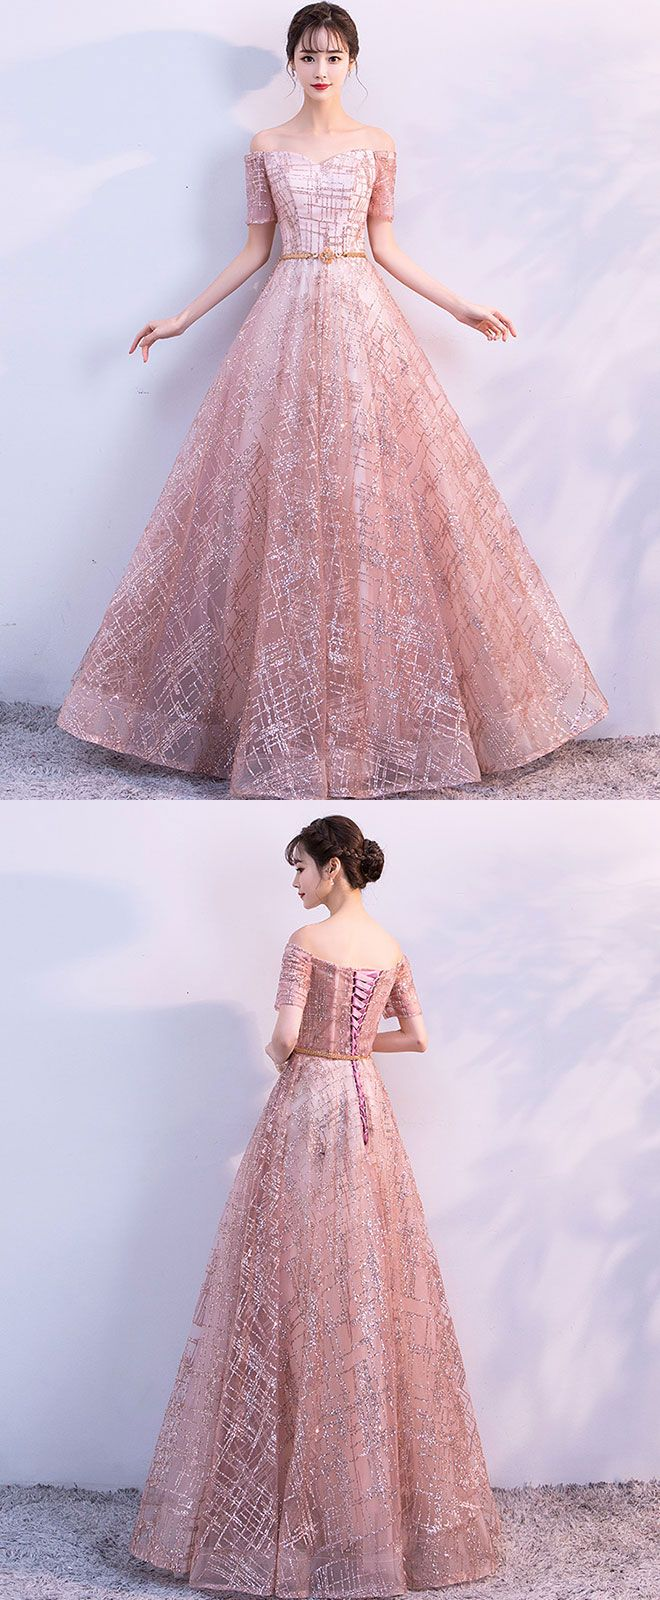 Beautiful tulle long prom dress, evening dress | Prom | Pinterest ...